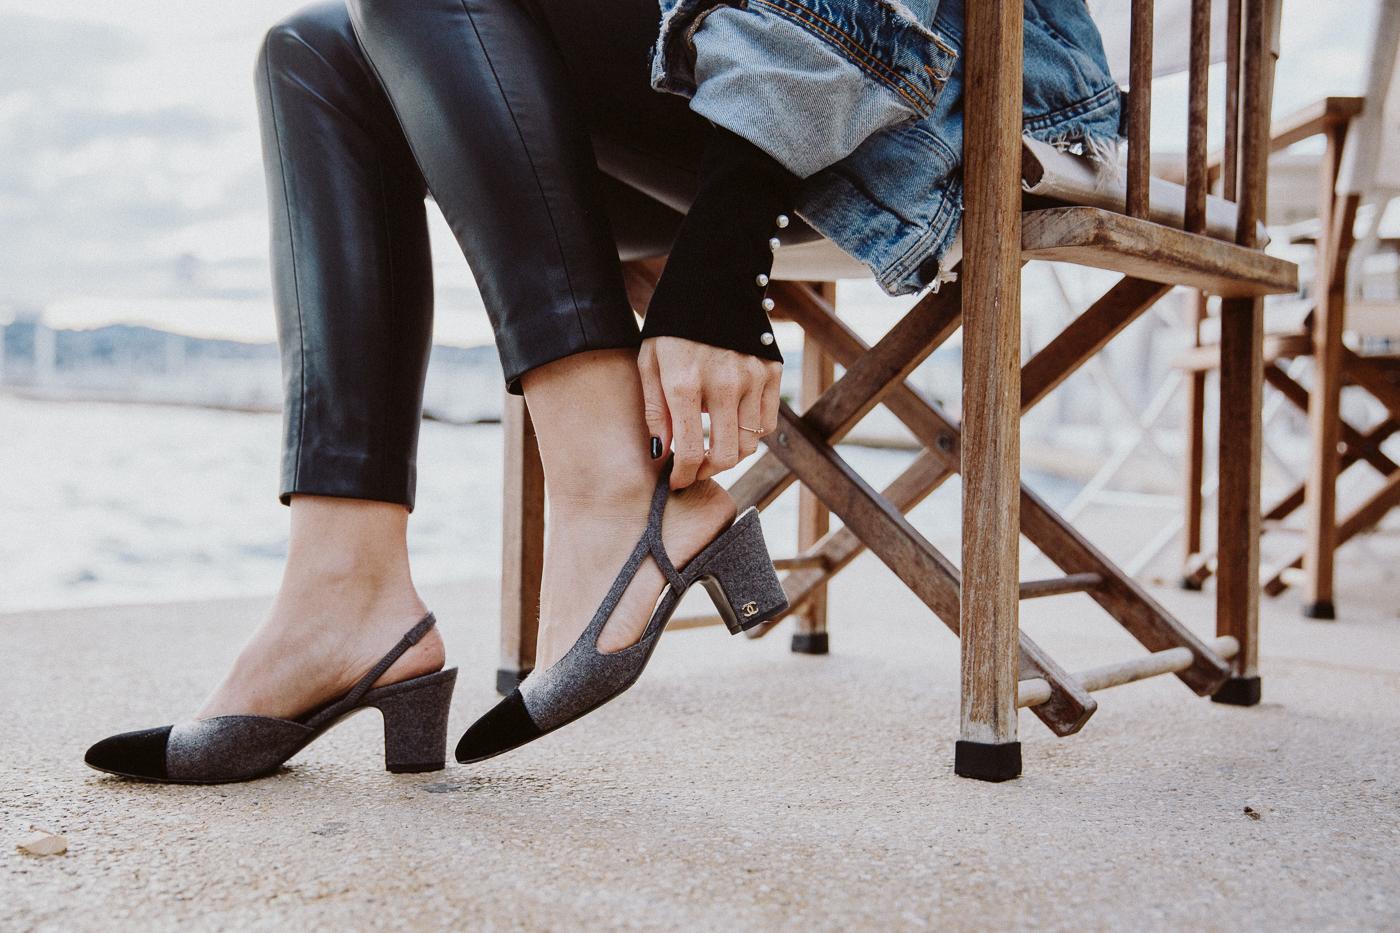 Chanel Slingback Heels | Bikinis & Passports